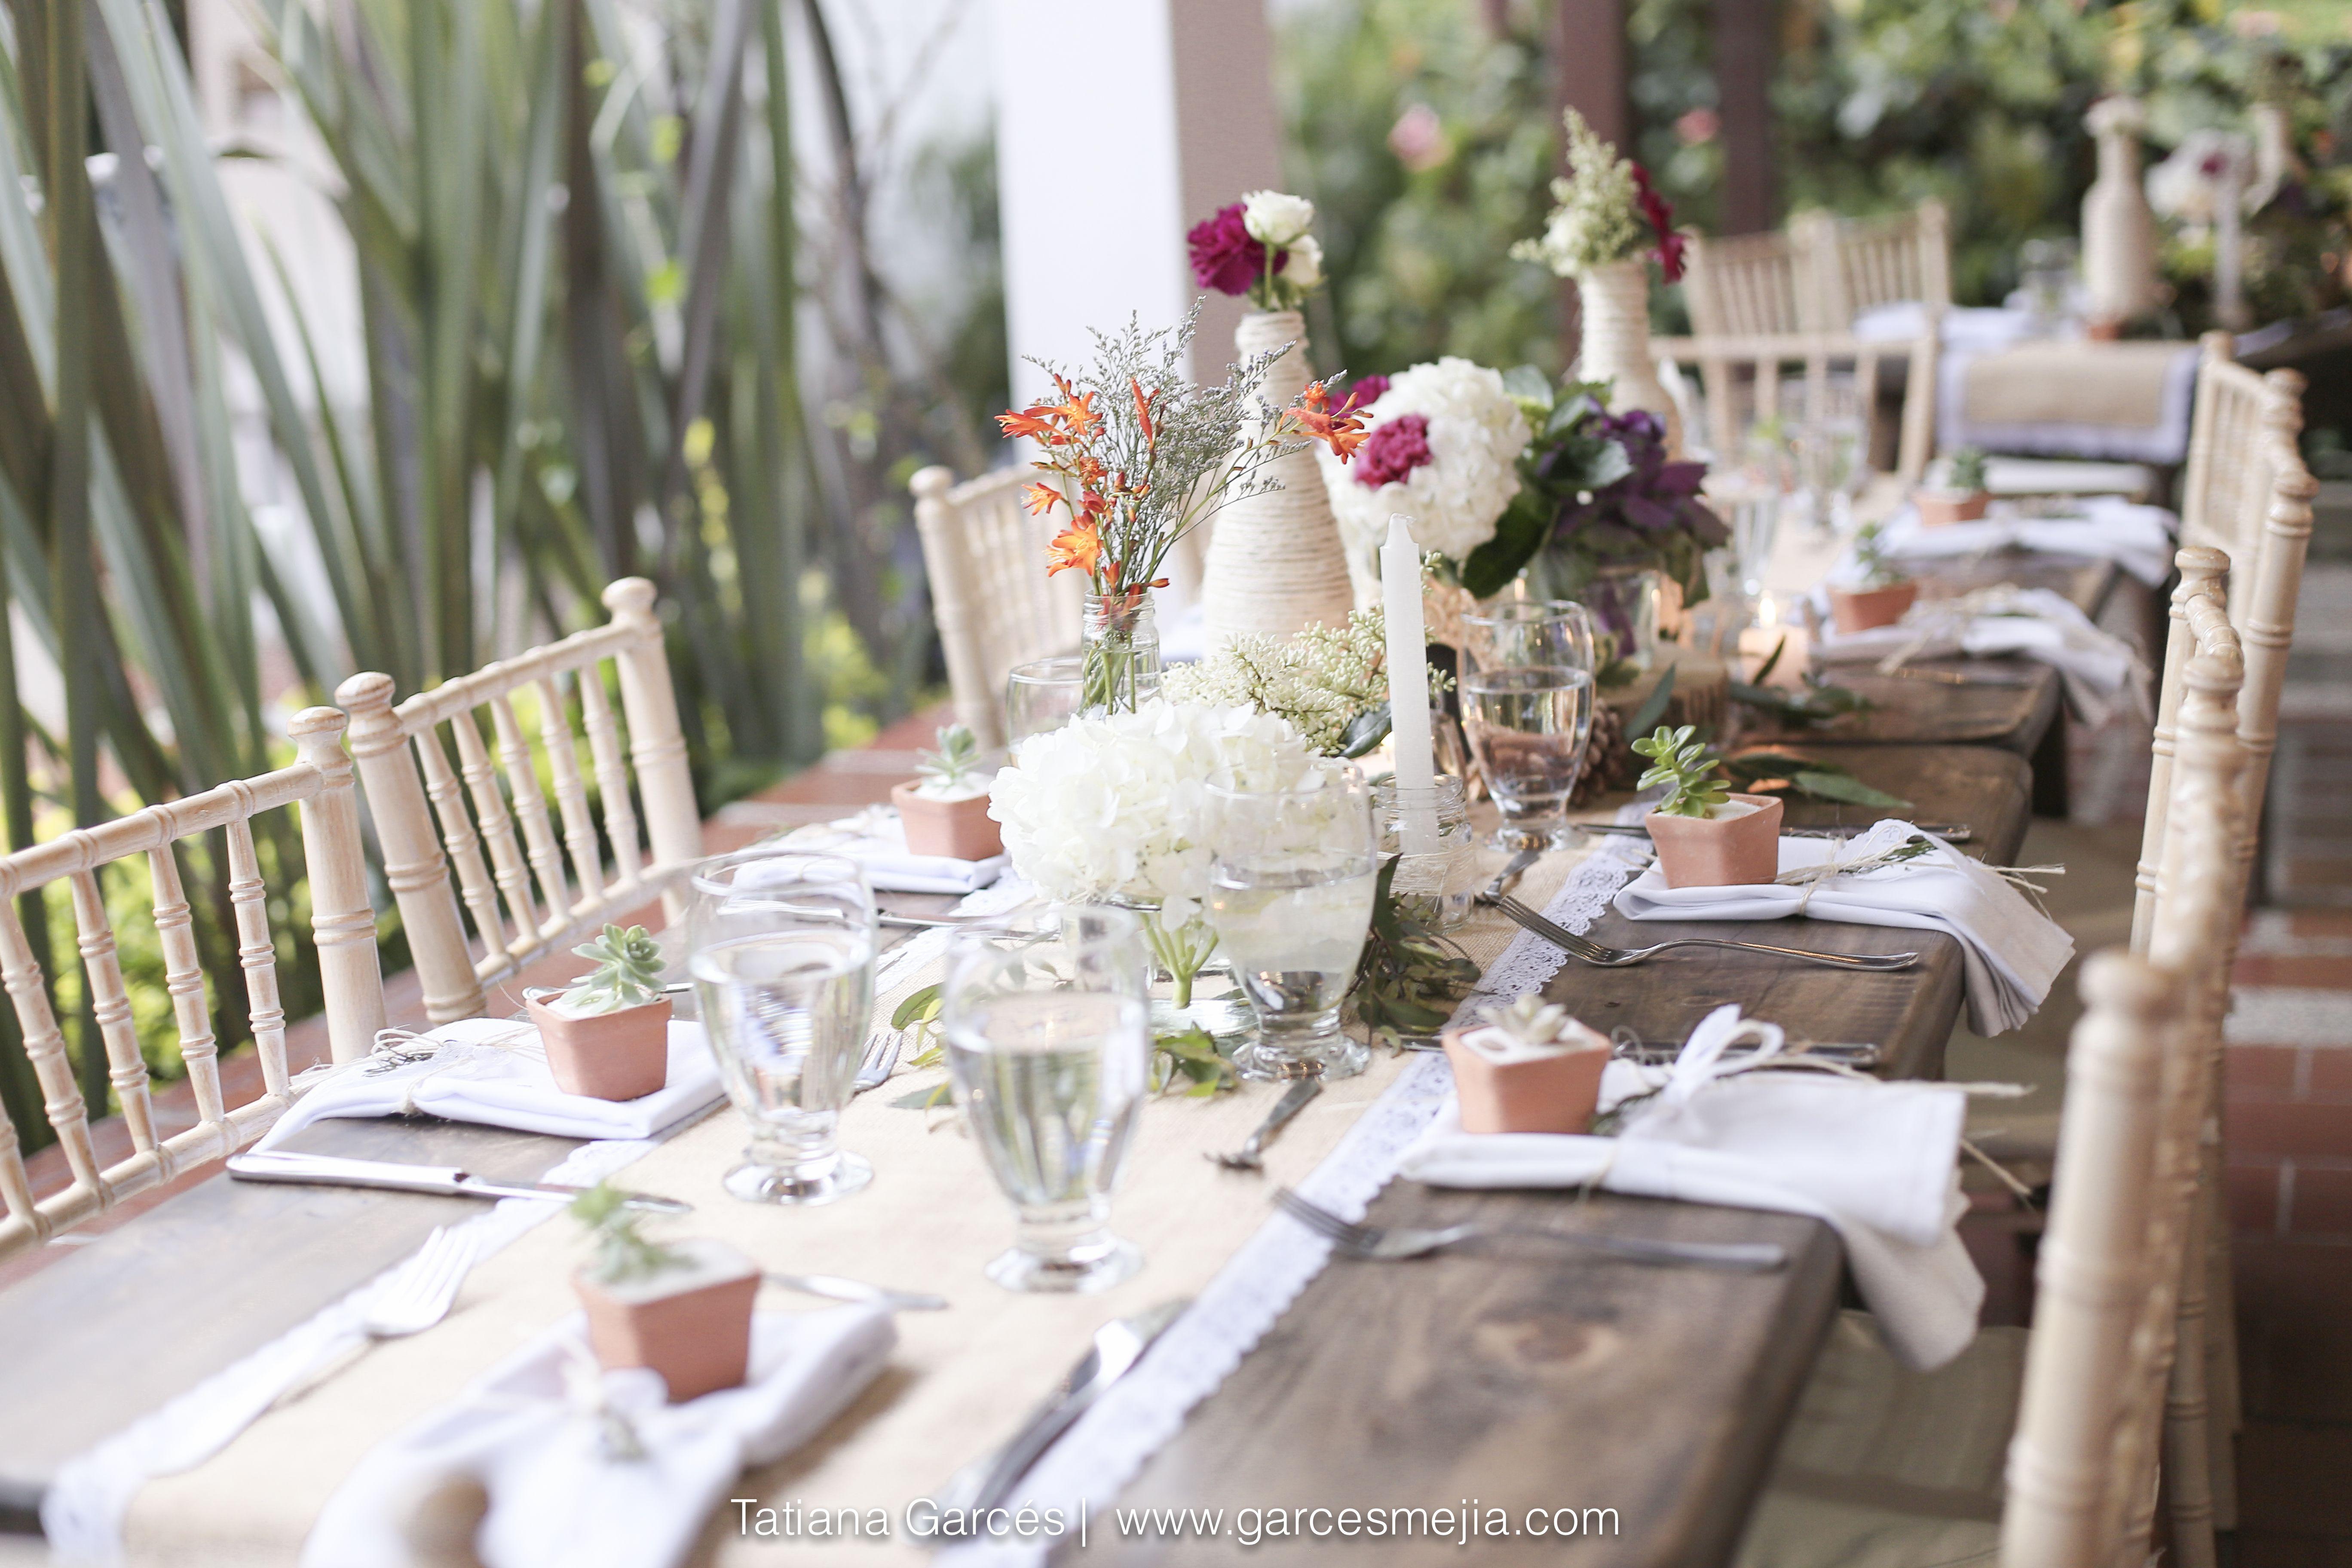 Decoraci n para bodas campestres decoraci n hermosa para for Decoracion boda campestre